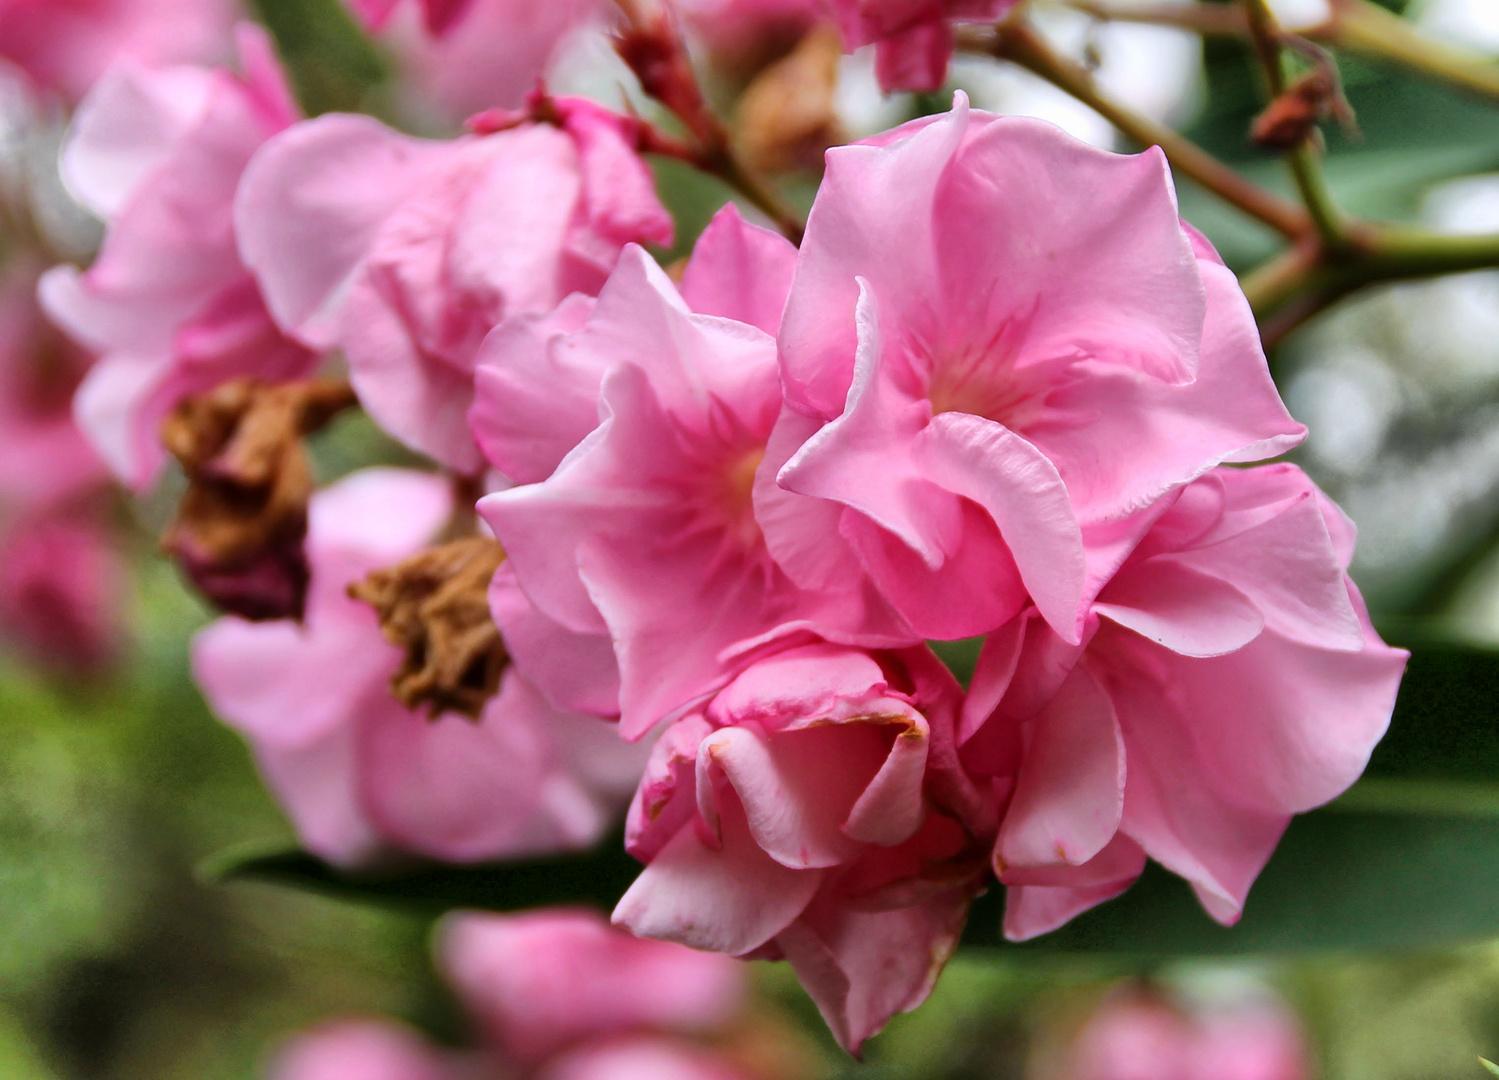 En flor rosa